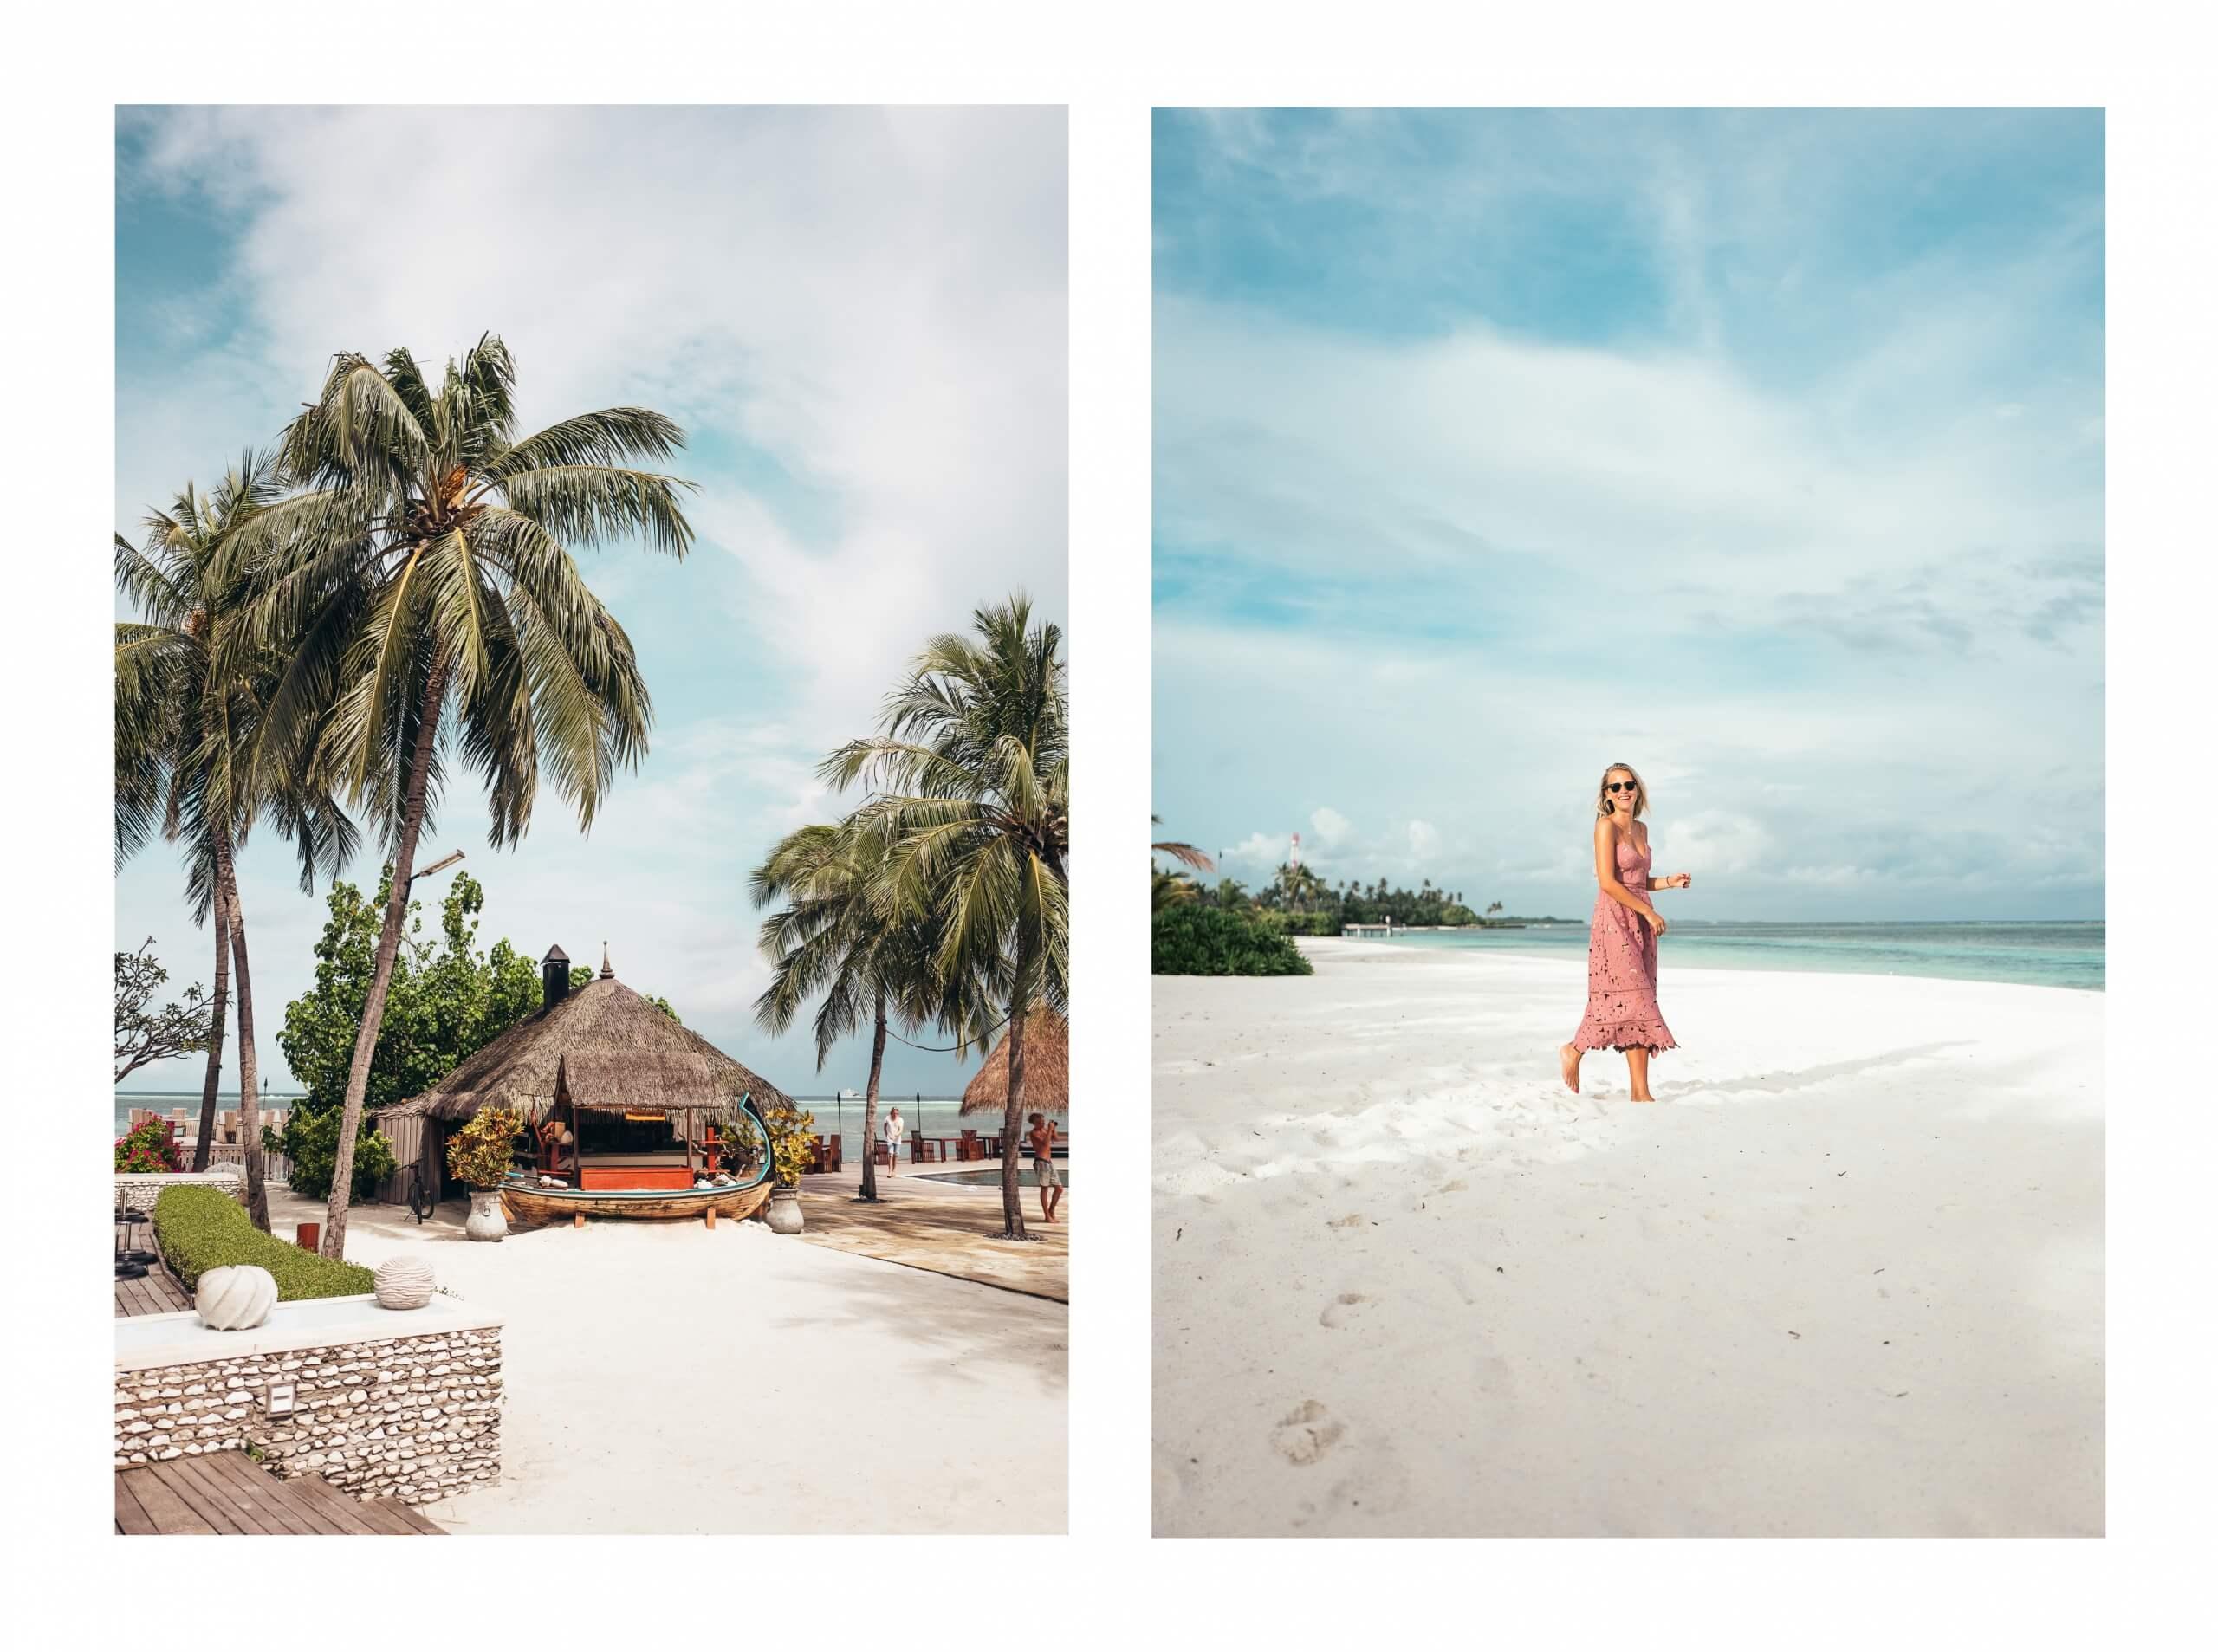 janni-deler-maldives-snapshotsl1140727-copy